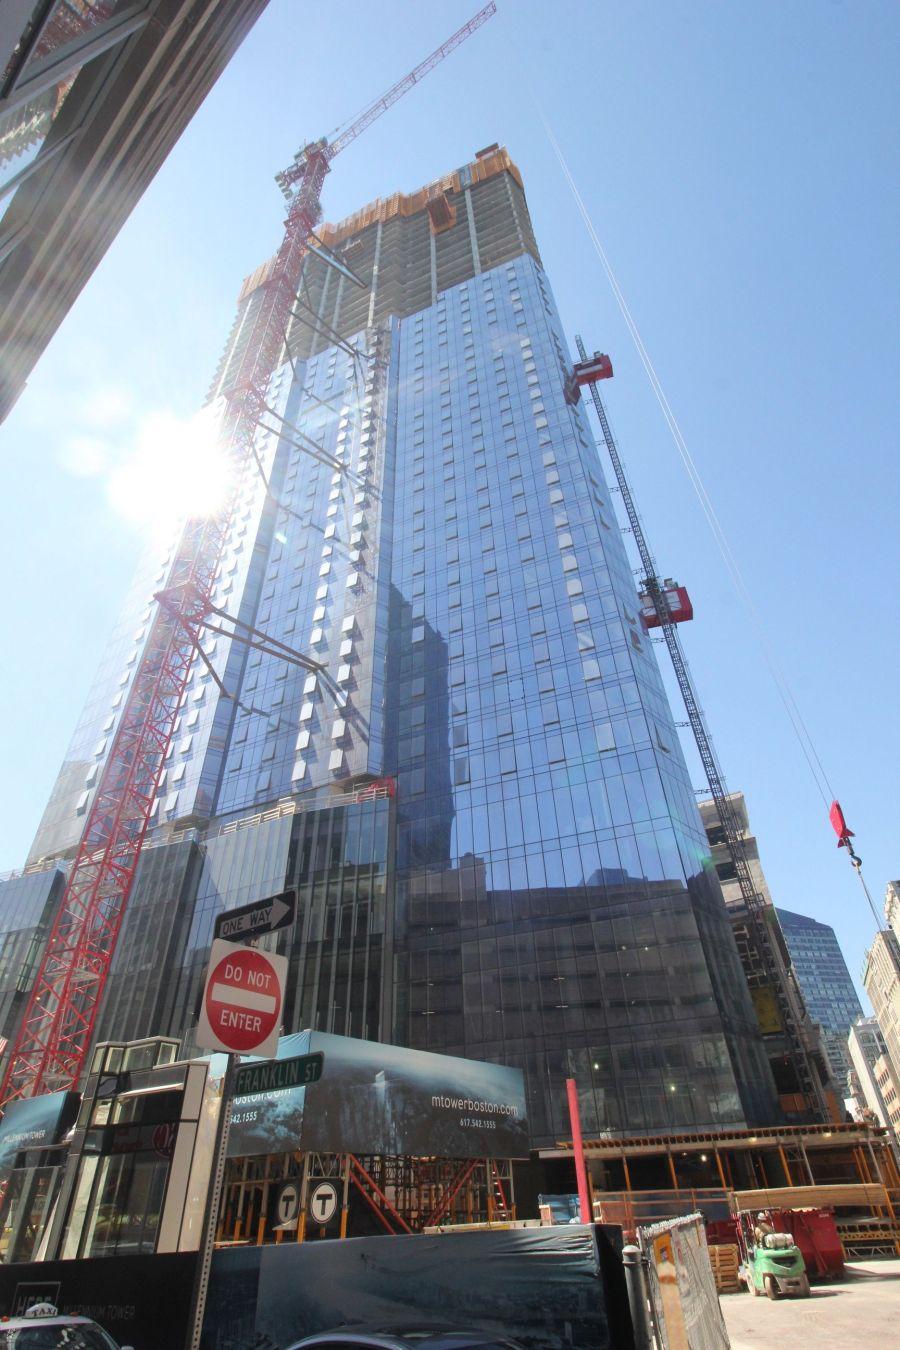 boston-millenium-tower-july-30-2015